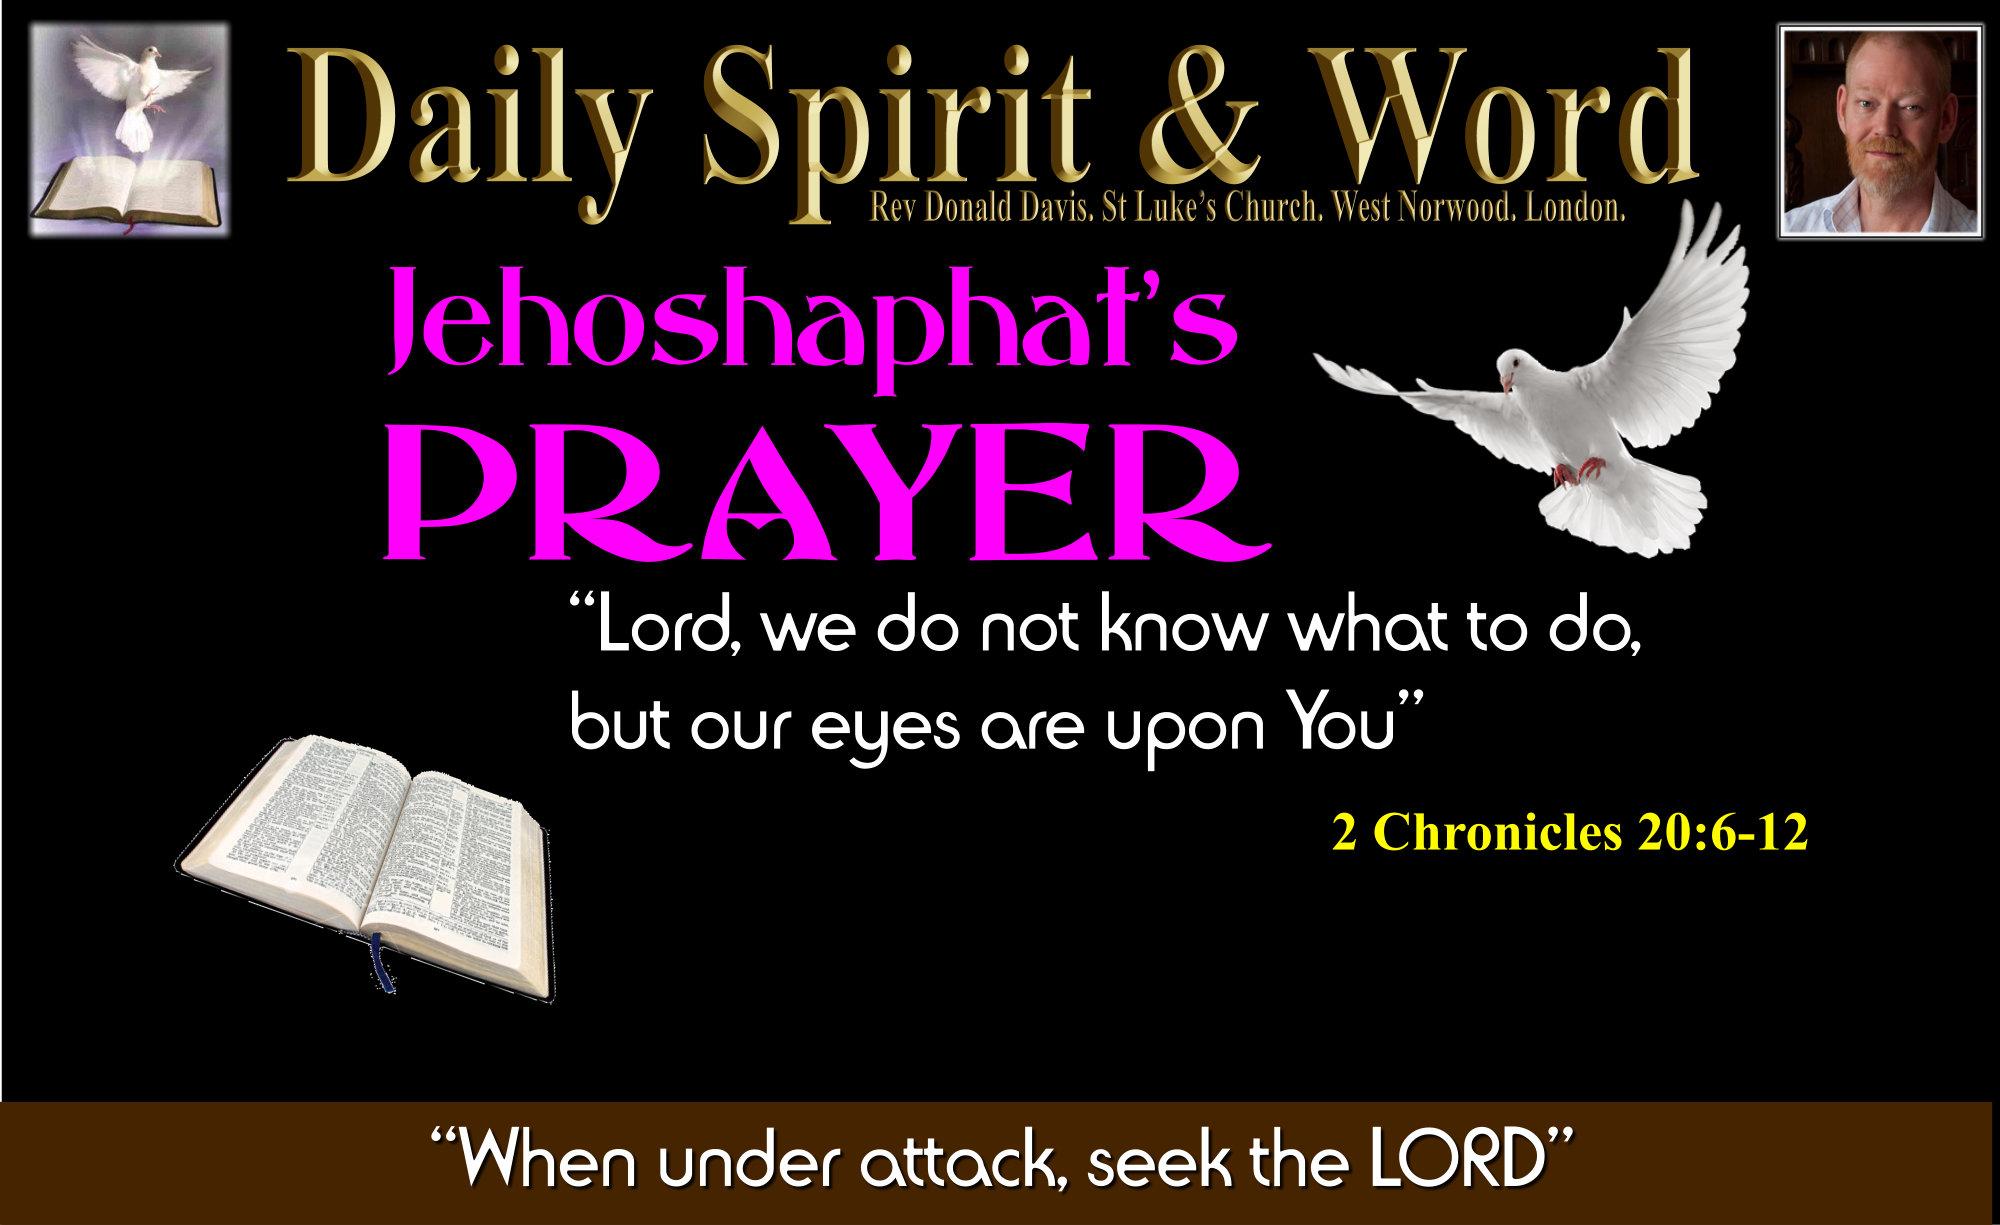 Jehoshaphat's prayer